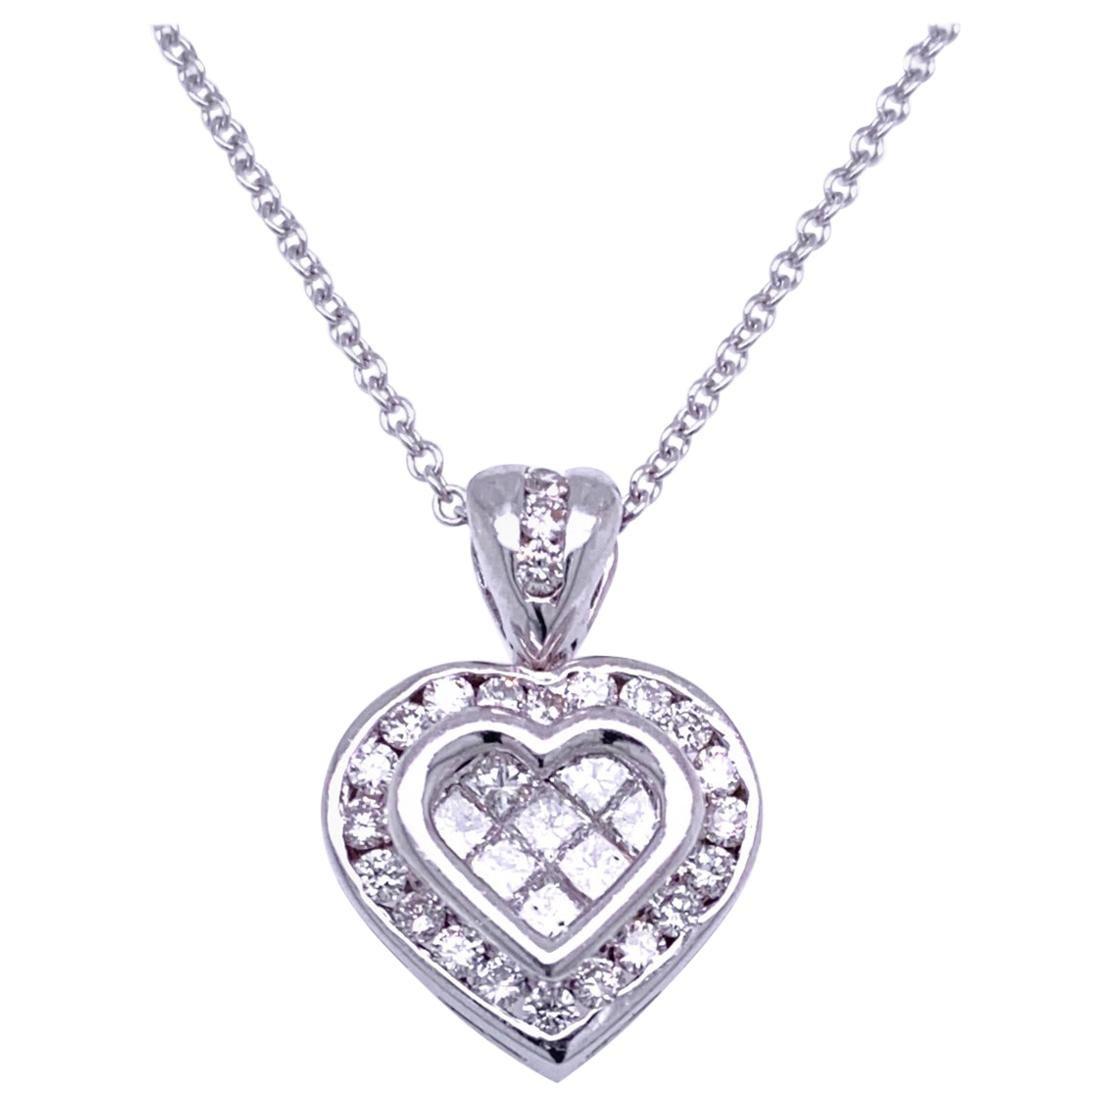 0.81 Carat Diamond 18 Karat Gold Hearts Pendant Necklace